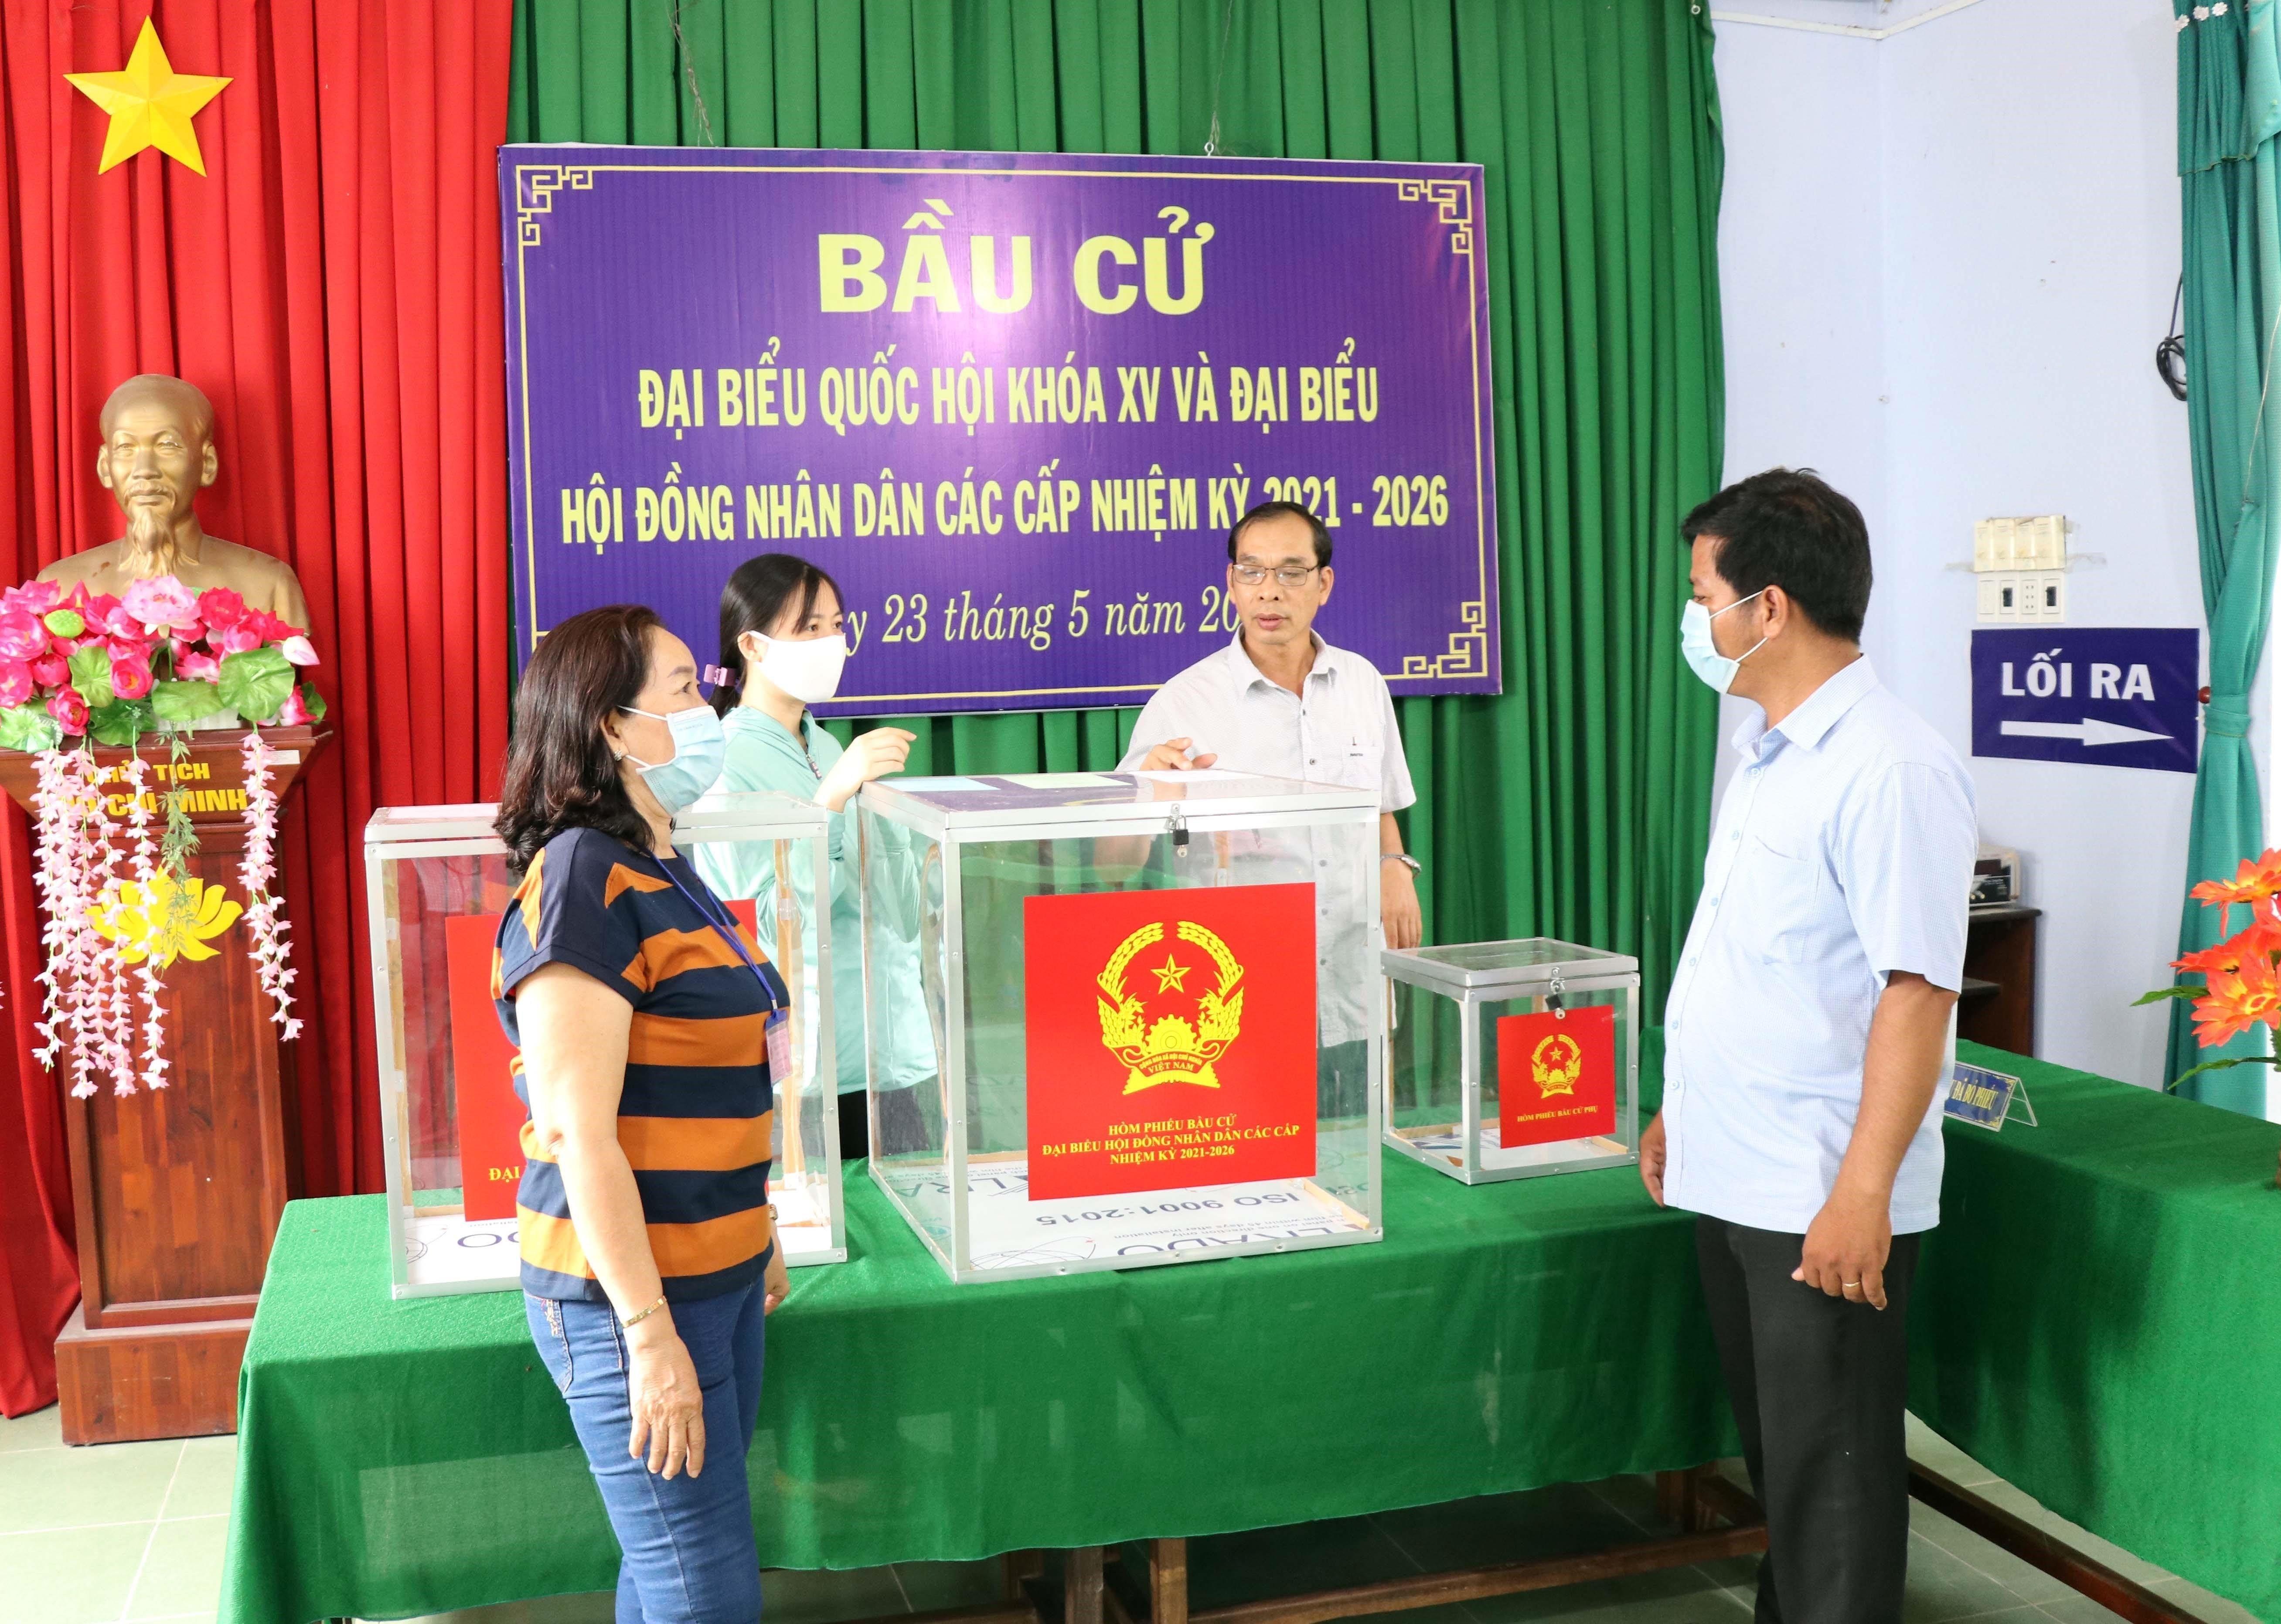 Quang Ninh, Gia Lai, Ninh Thuan san sang cho ngay hoi bau cu hinh anh 3